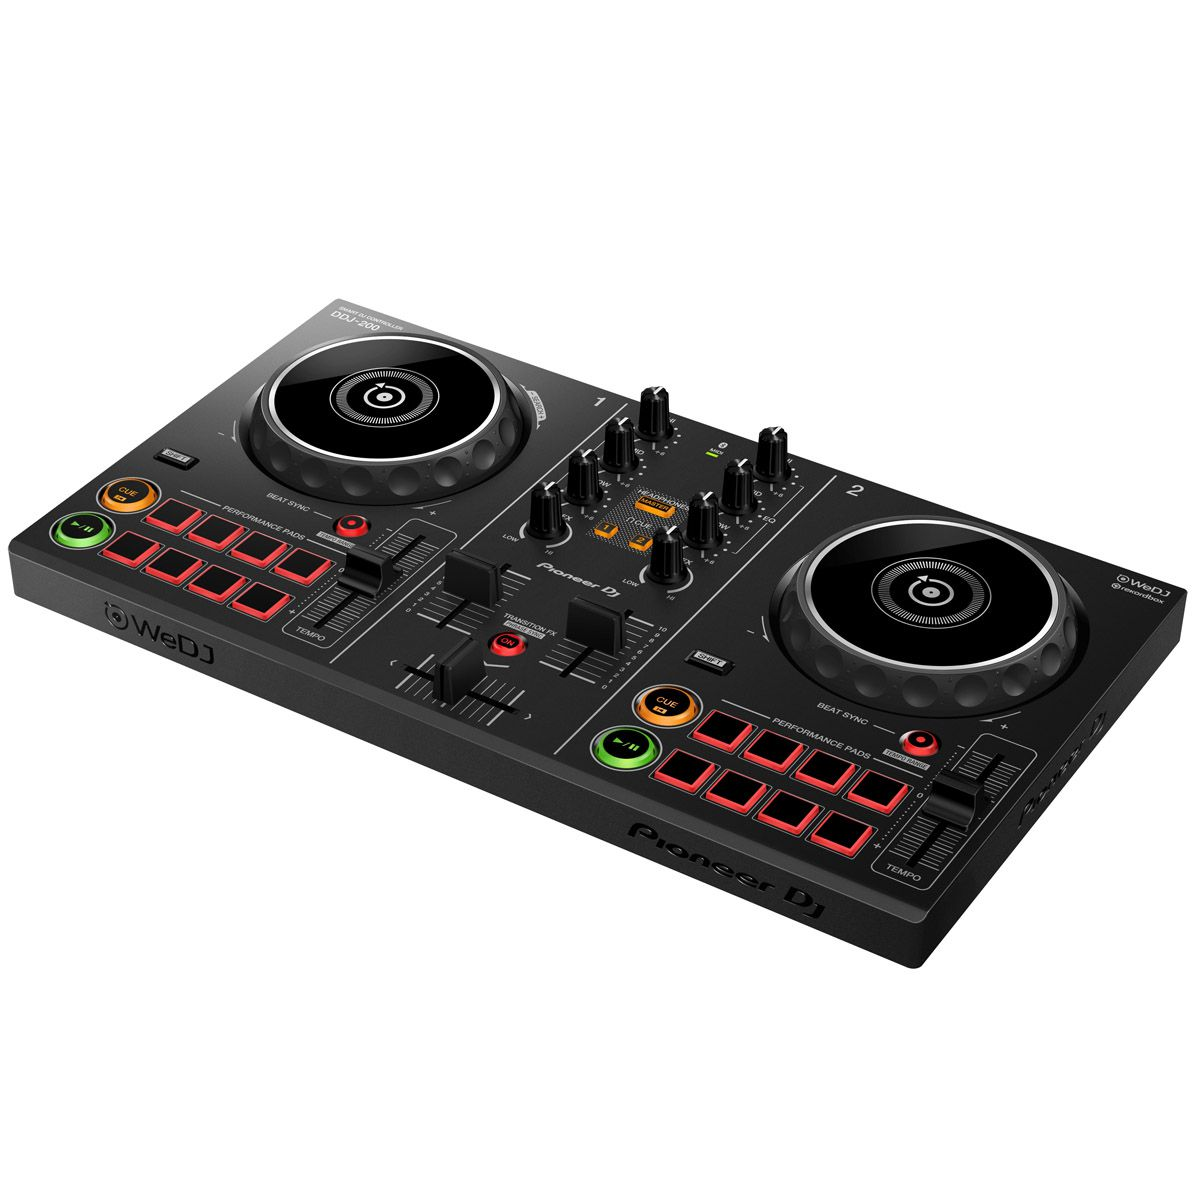 Controladora Pioneer DJ DDJ 200